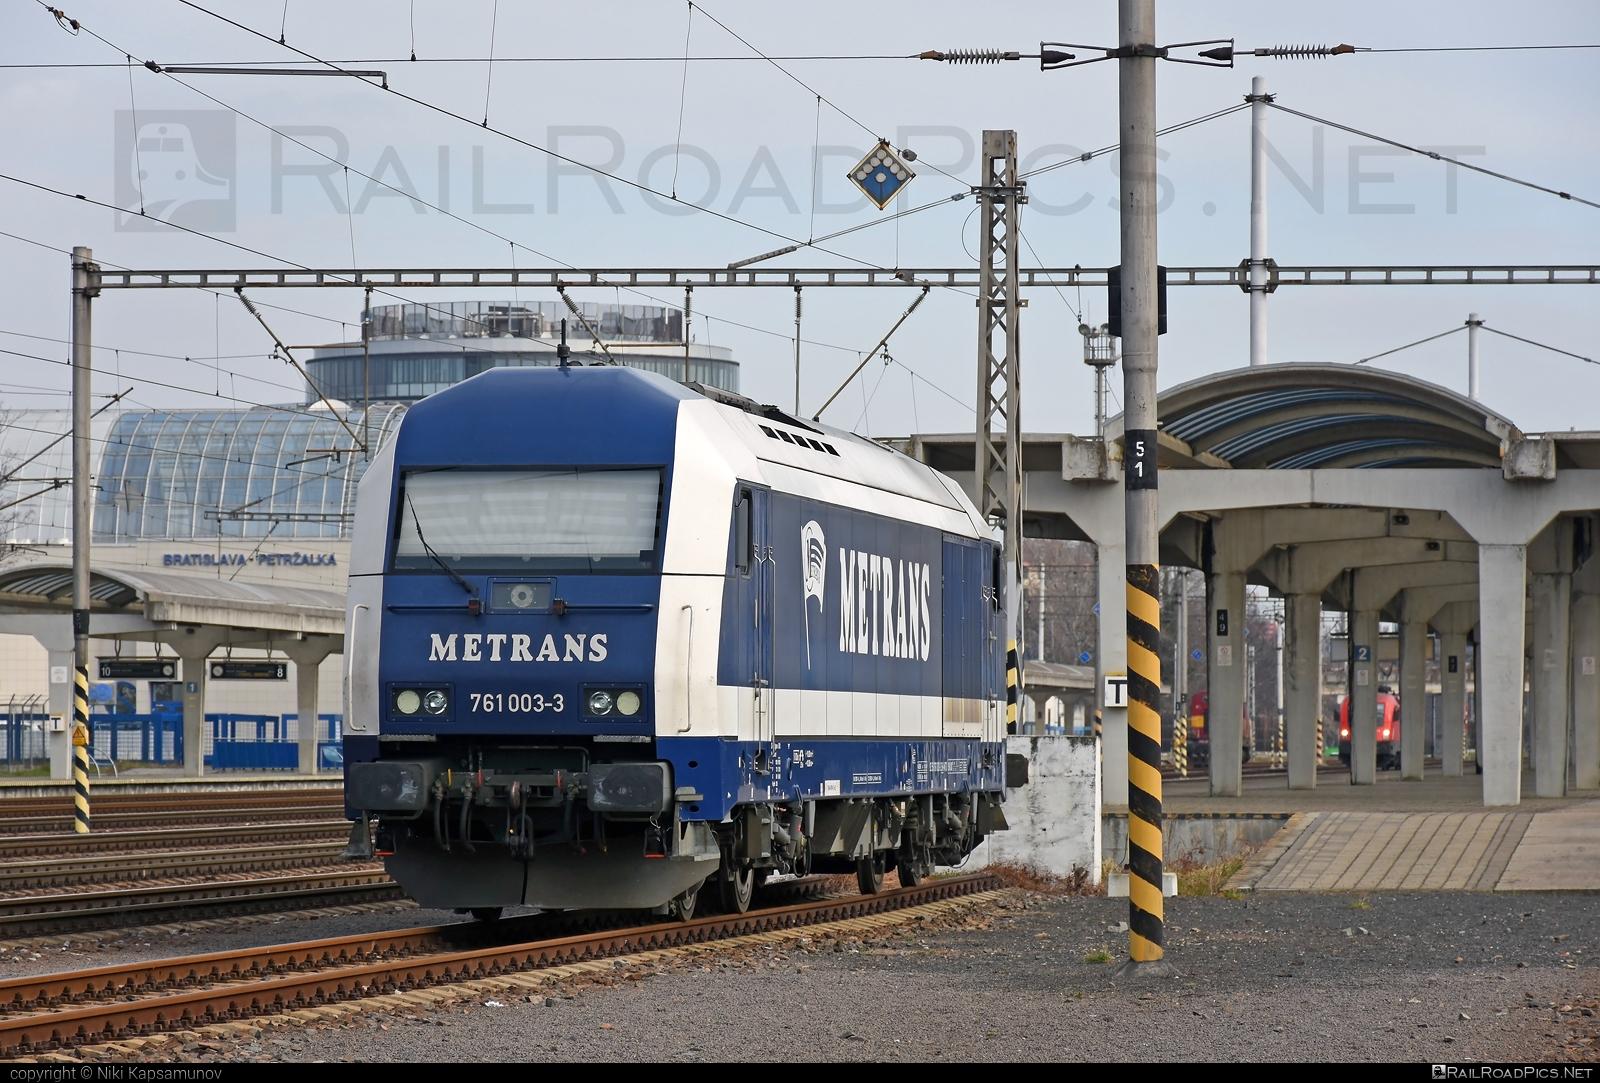 Siemens ER20 - 761 003-3 operated by METRANS (Danubia) a.s. #er20 #er20hercules #eurorunner #hercules #hhla #metrans #metransdanubia #siemens #siemenser20 #siemenser20hercules #siemenseurorunner #siemenshercules